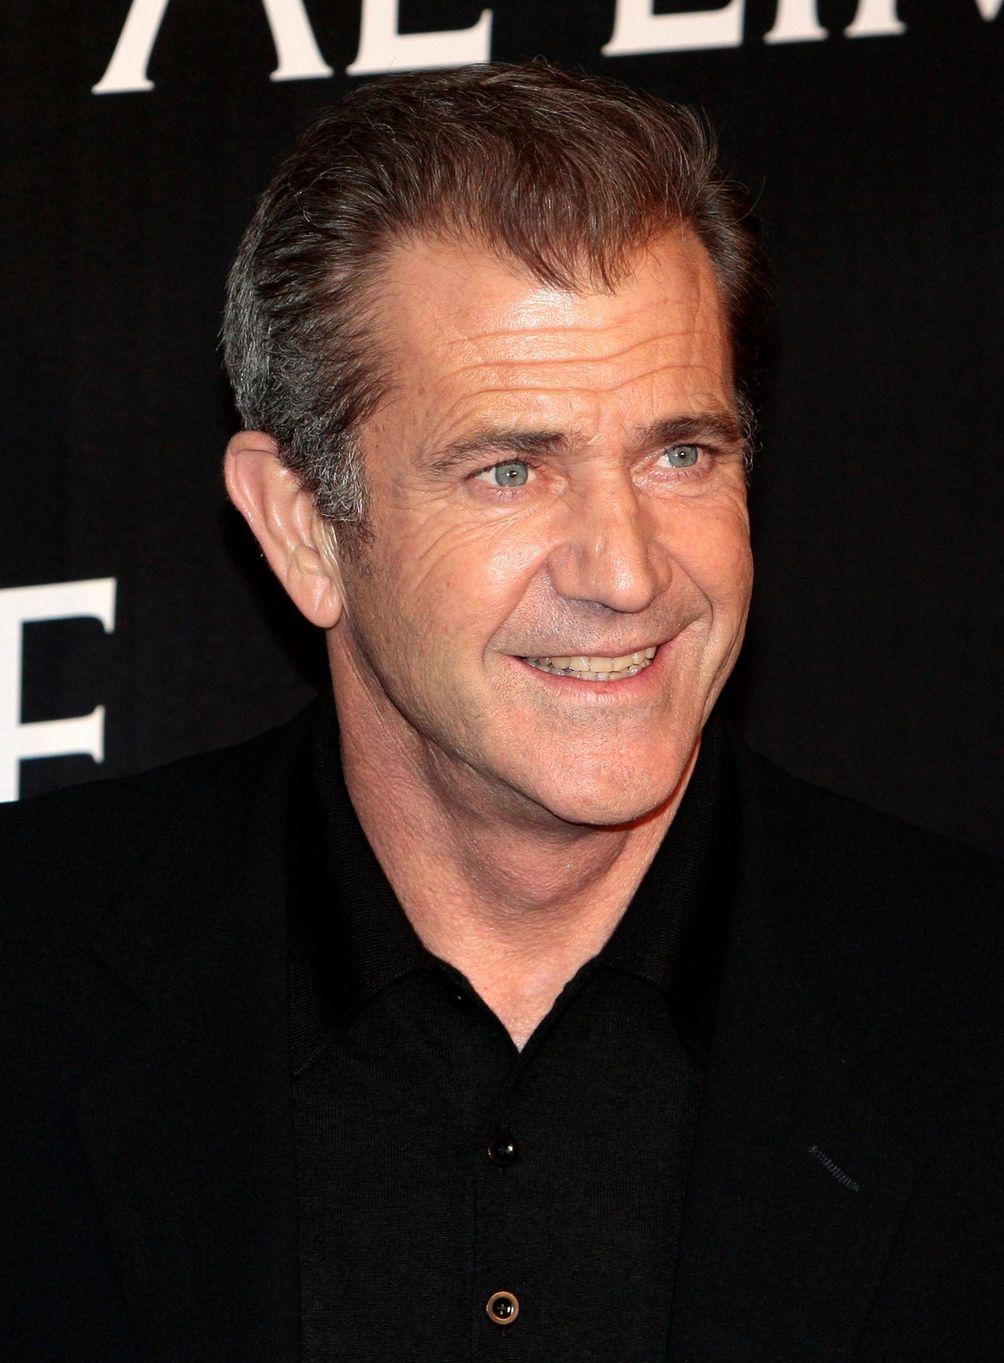 Oscar winner Mel Gibson sought rehab treatment in